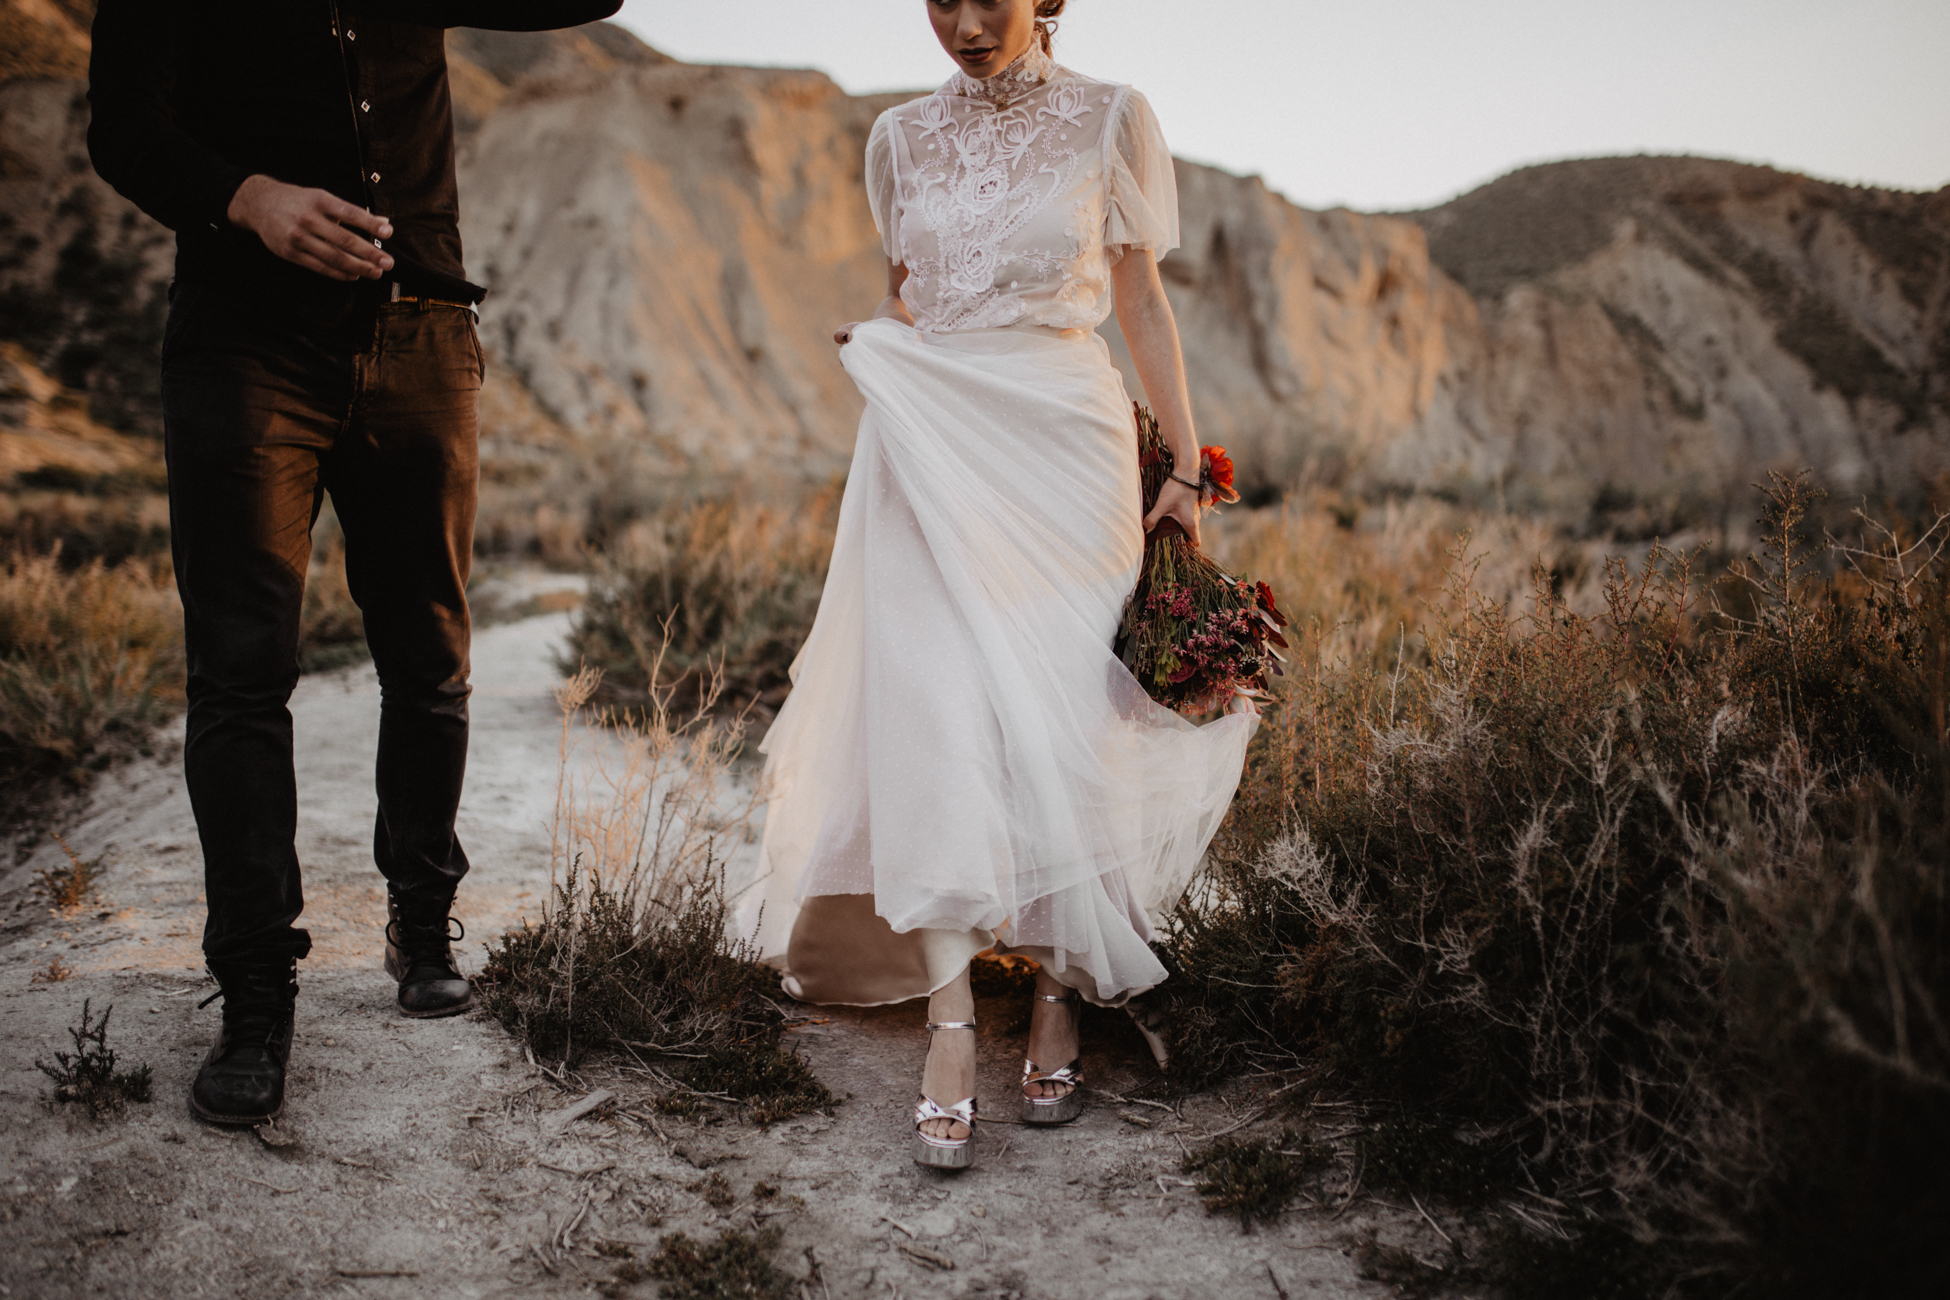 thenortherngirlphotography_photography_thenortherngirl_rebeccascabros_wedding_weddingphotography_weddingphotographer_wood_muebles_deco_bodasdecaramelo_home_bedtime_gaywedding_editorial_desierto_desert_wildestdreams_amortexano-339.jpg